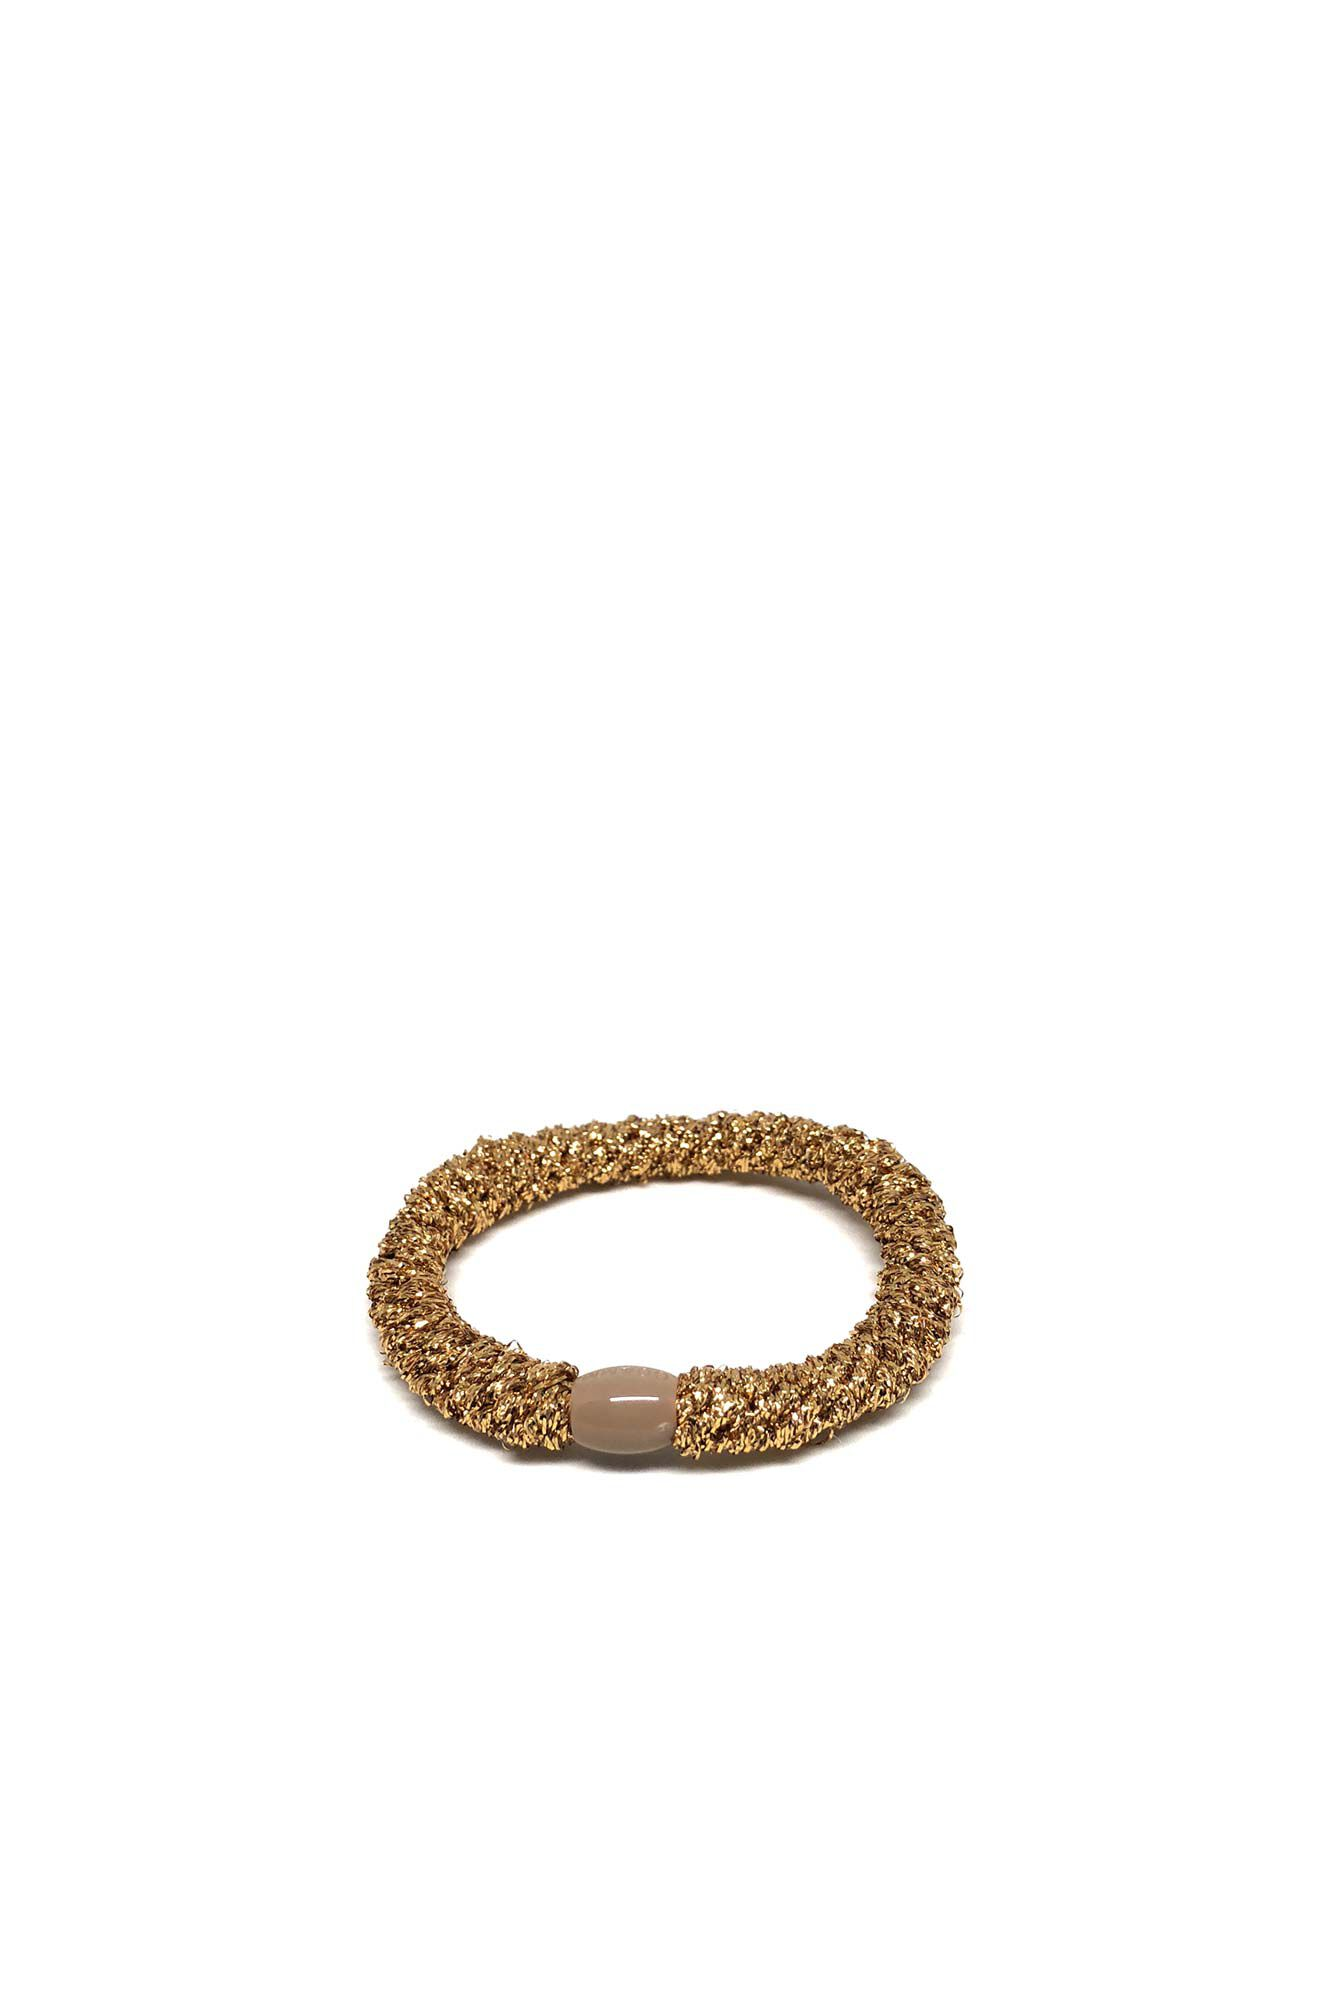 Bystær hairties 9799105, GLITTER GOLD